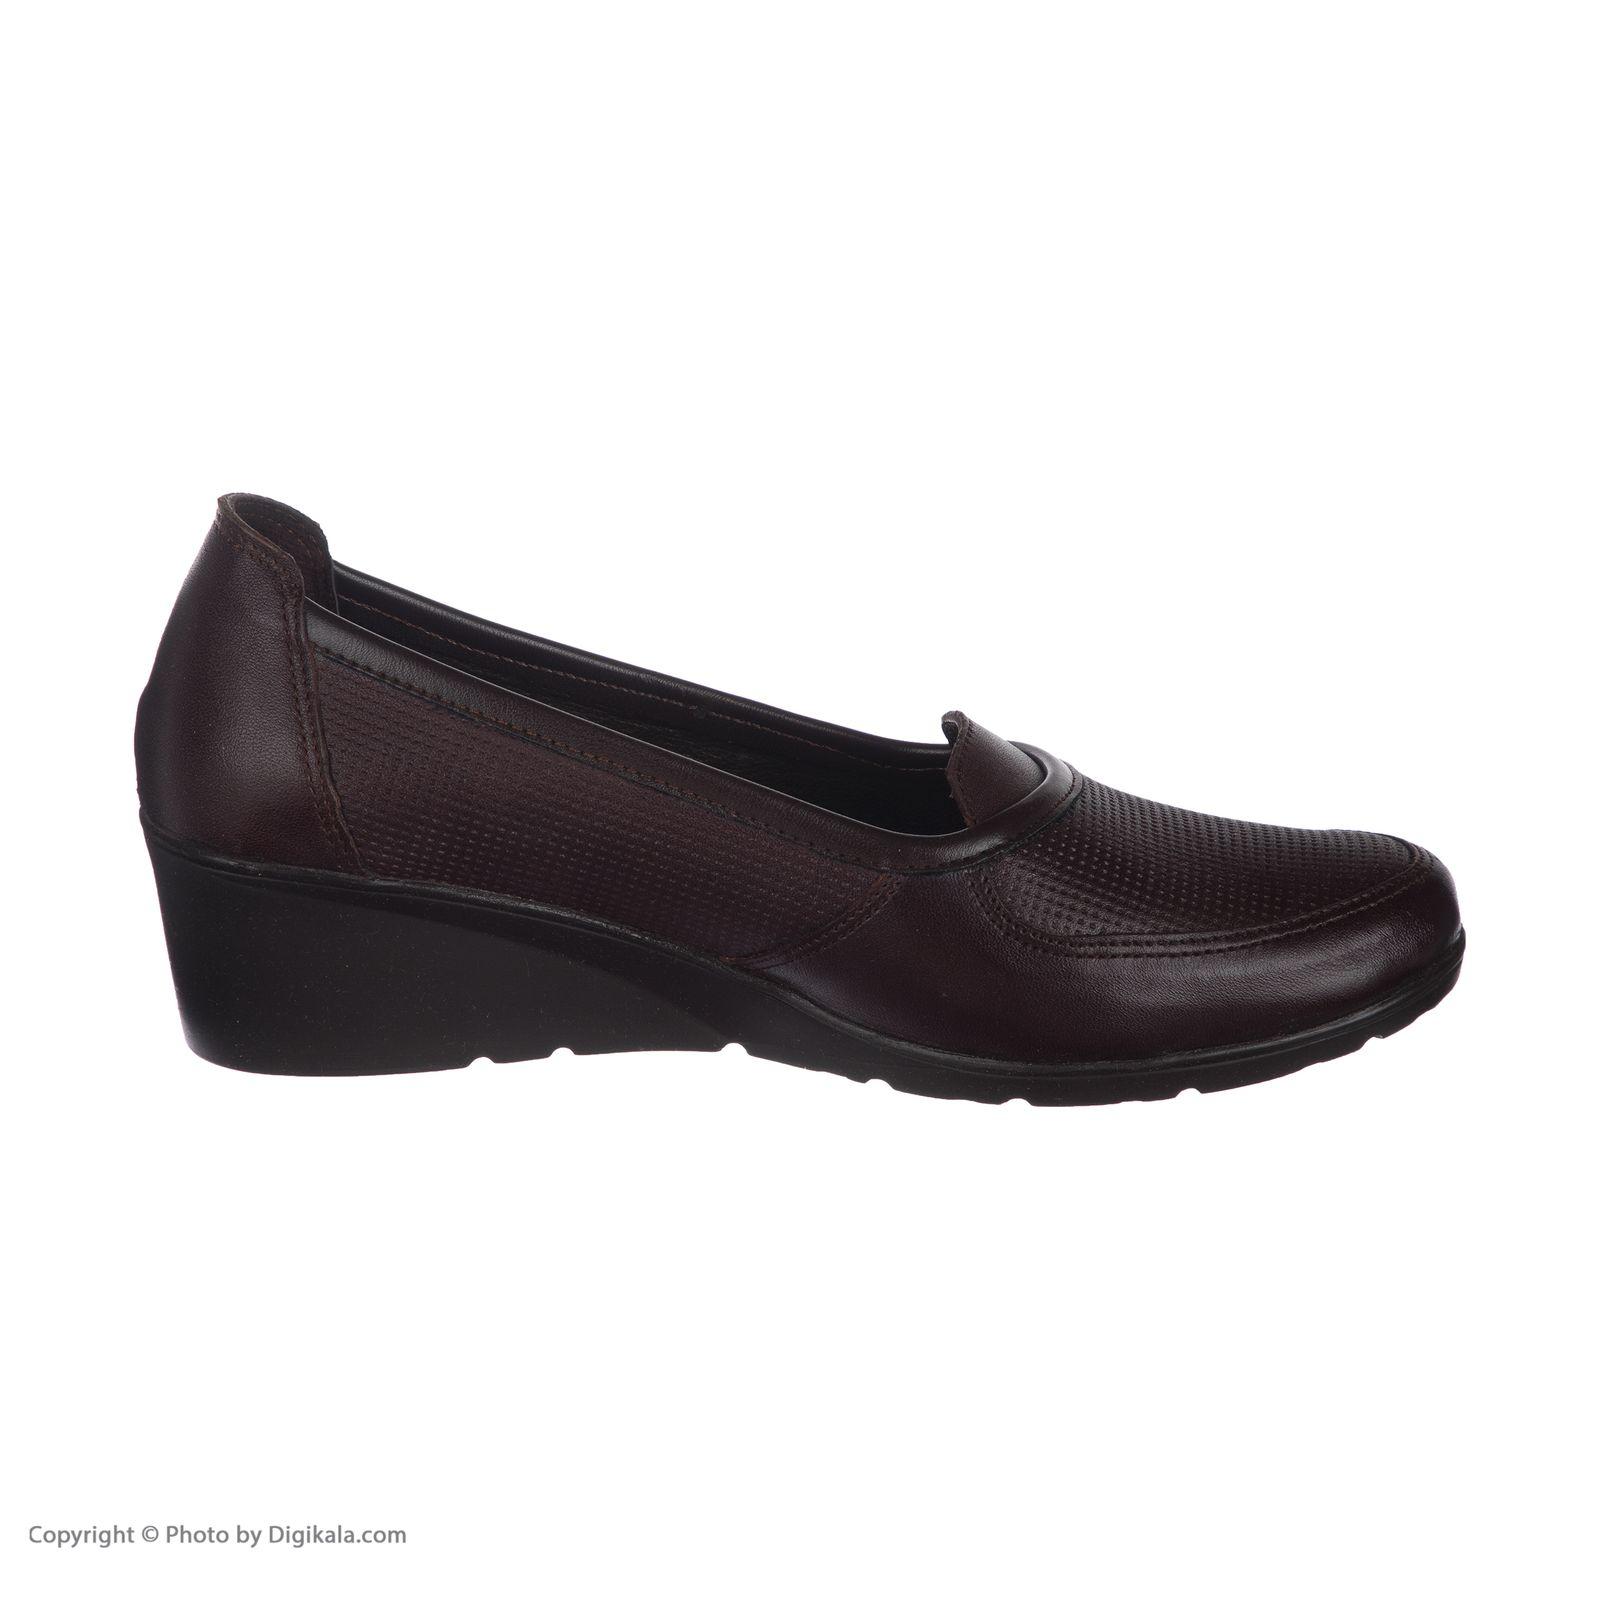 کفش روزمره زنانه دانادل مدل 6602A500104 -  - 5